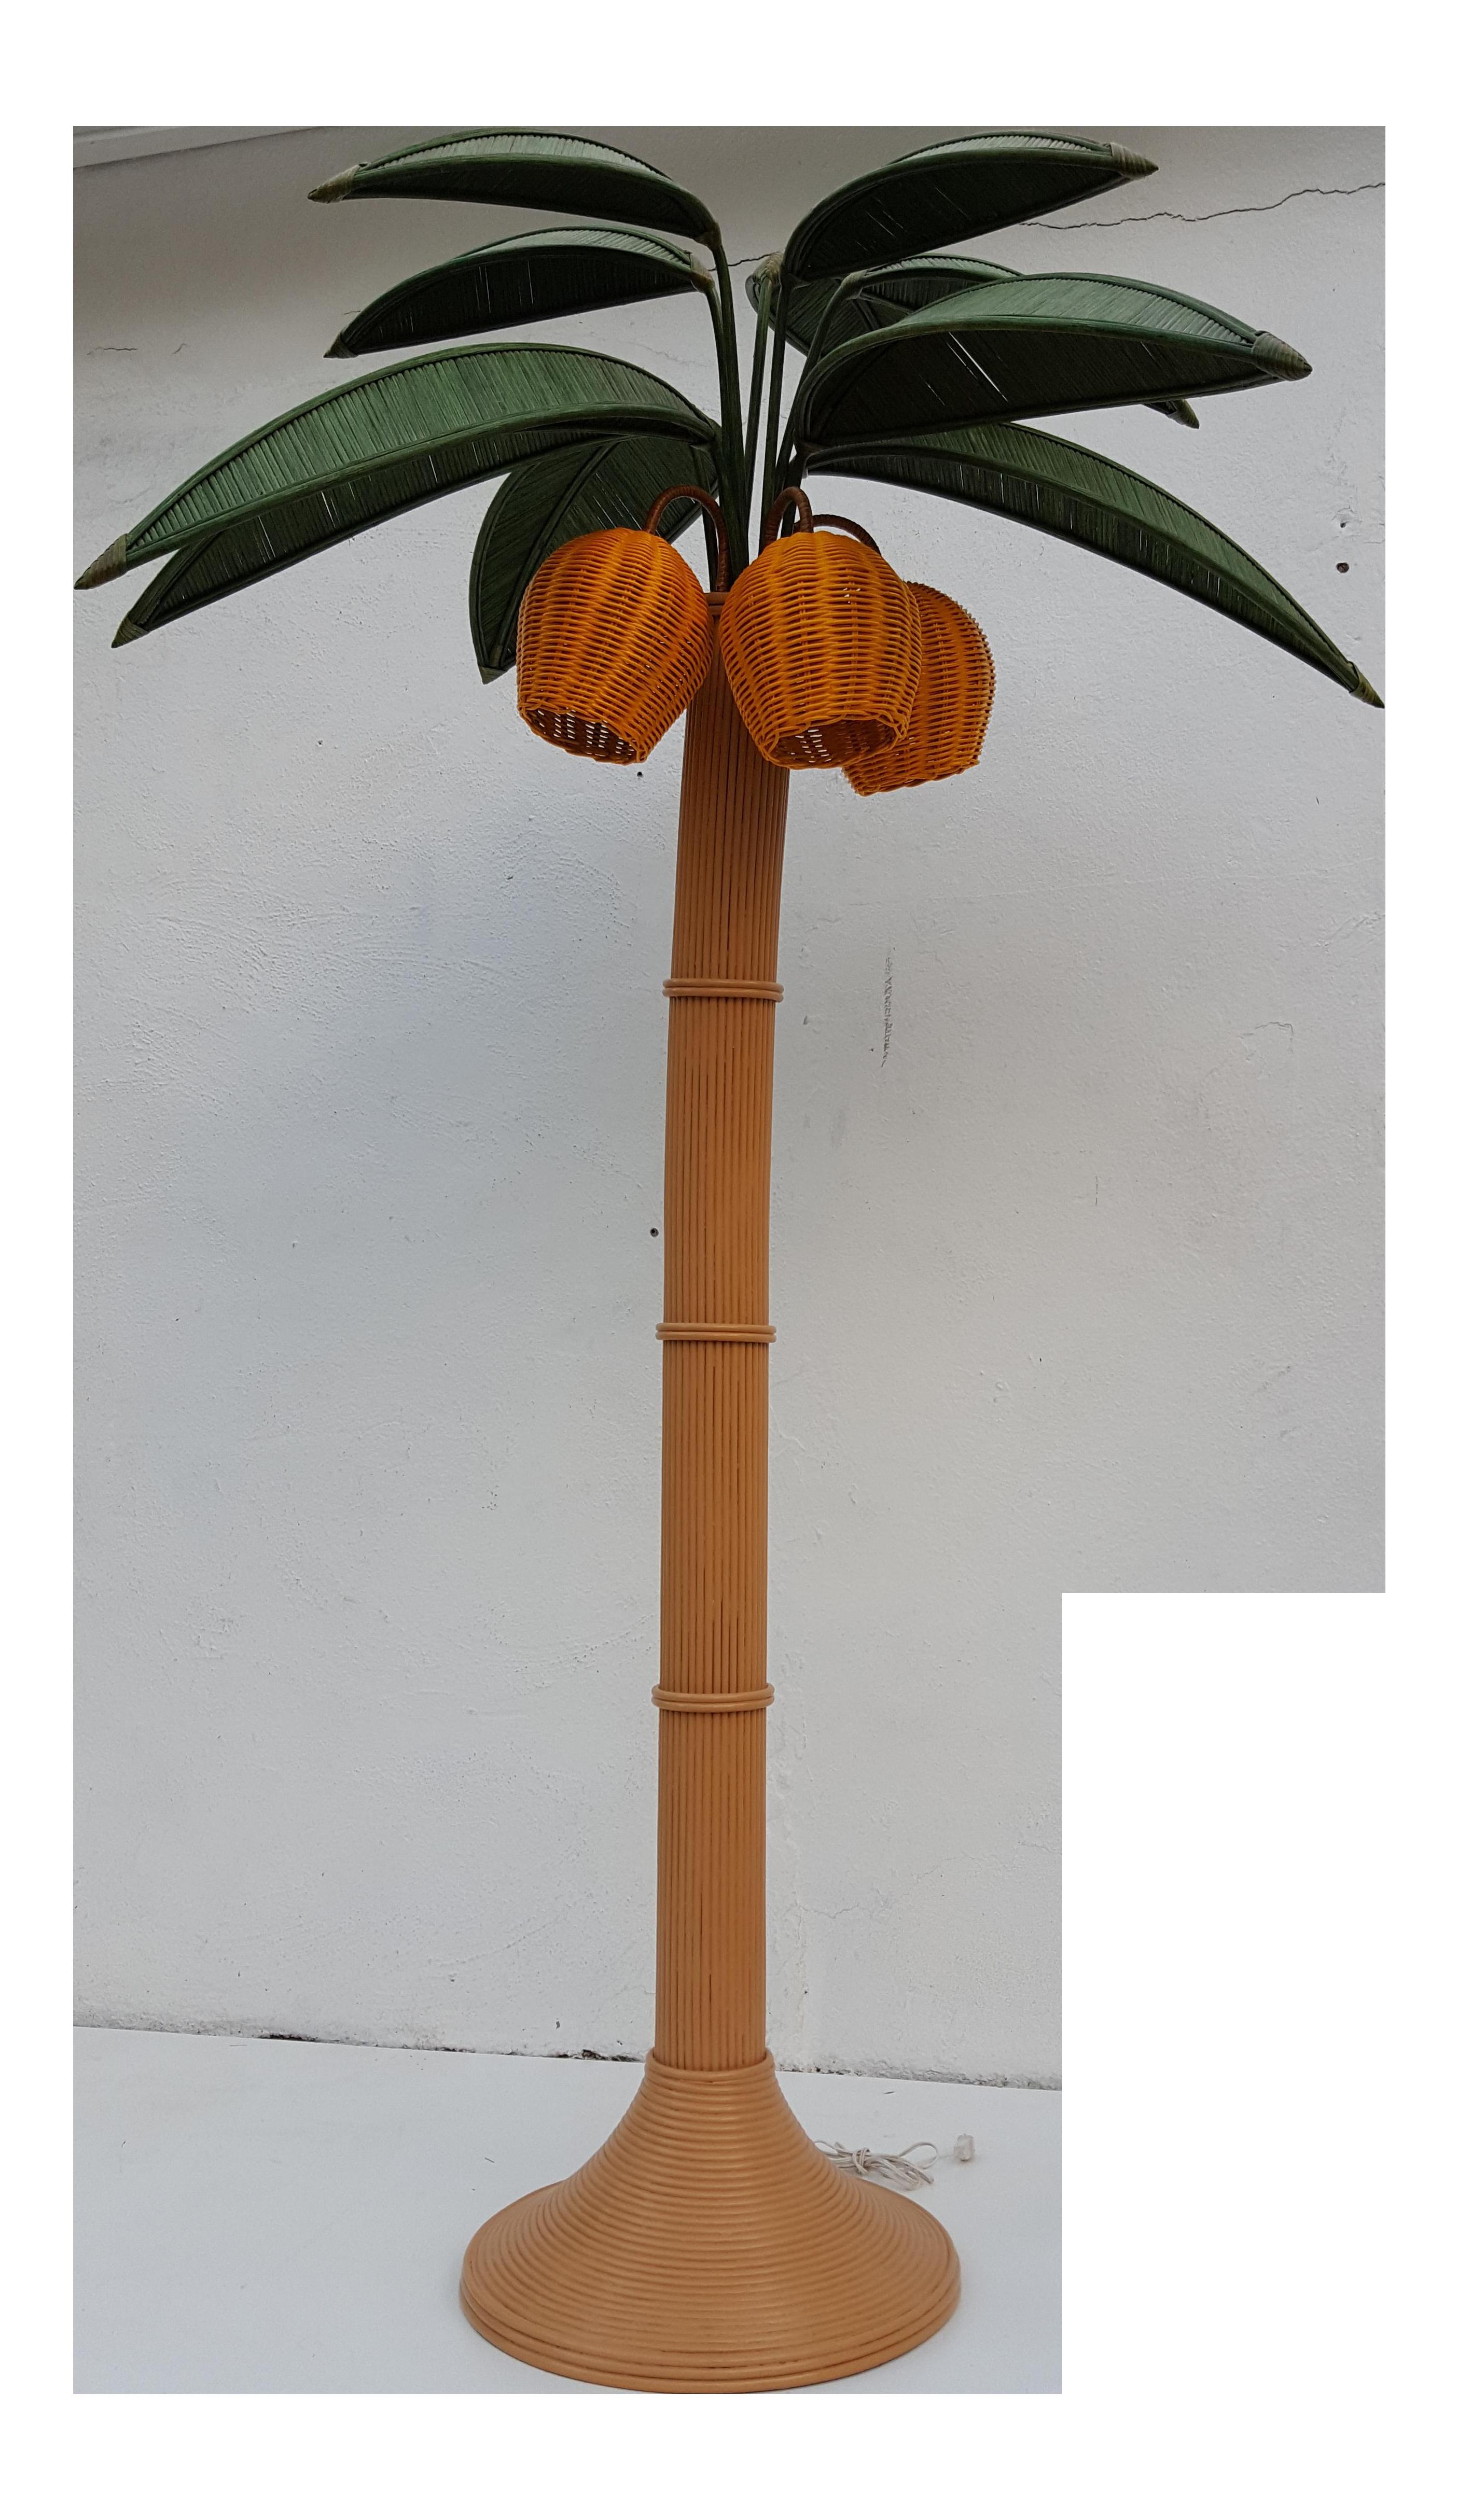 Tall rattan tree floor. Coconut clipart tropical coconut